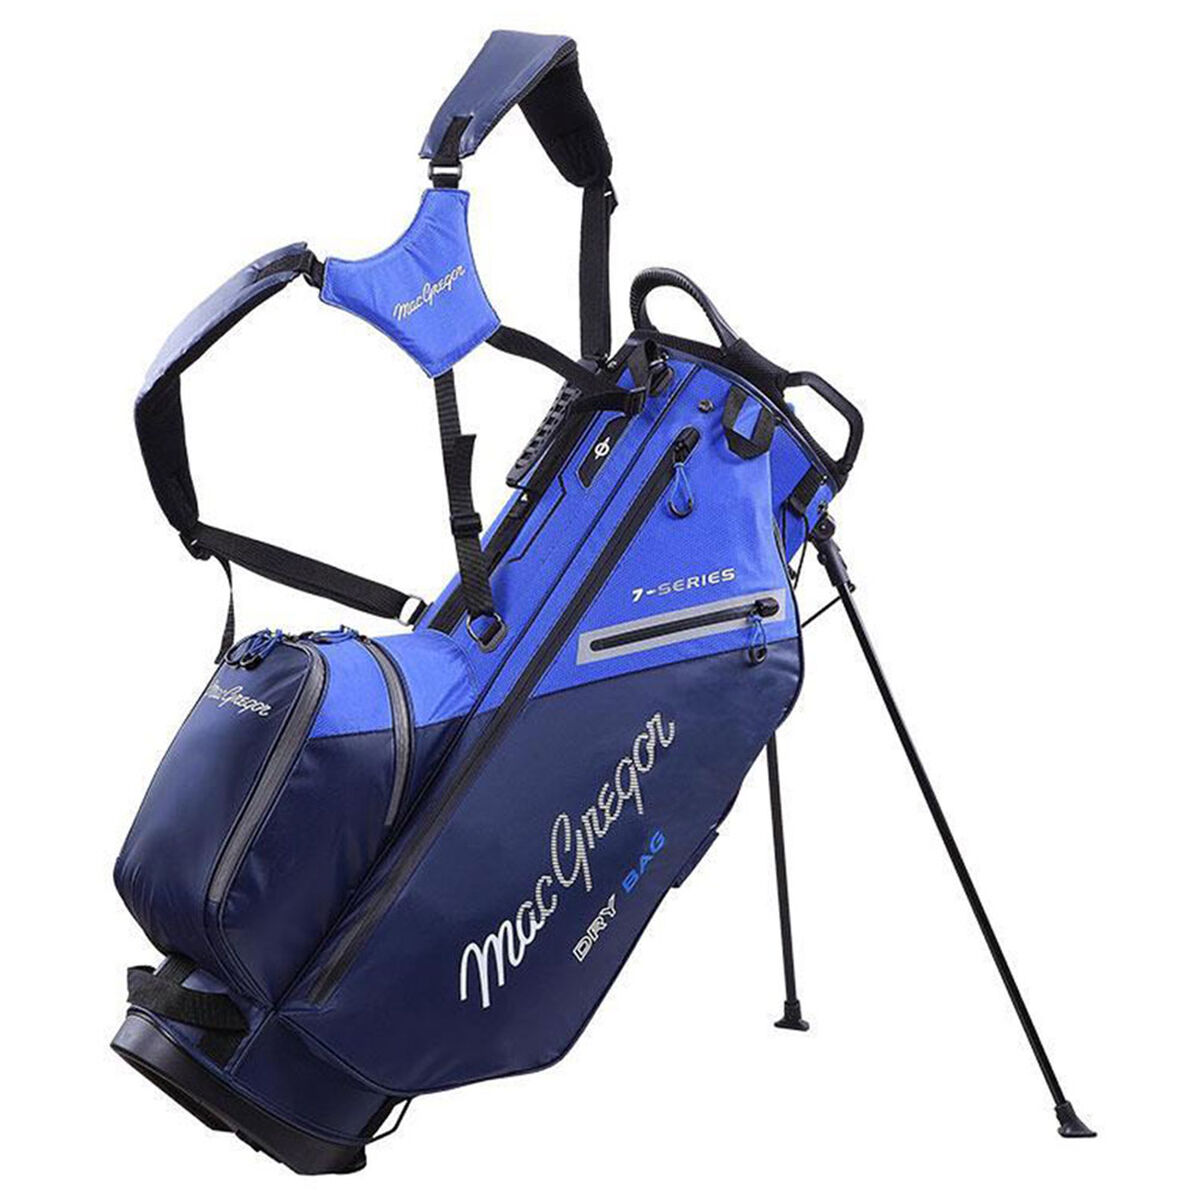 MacGregor 7-Series Water-Resistant Golf Stand Bag, Navy/royal   American Golf